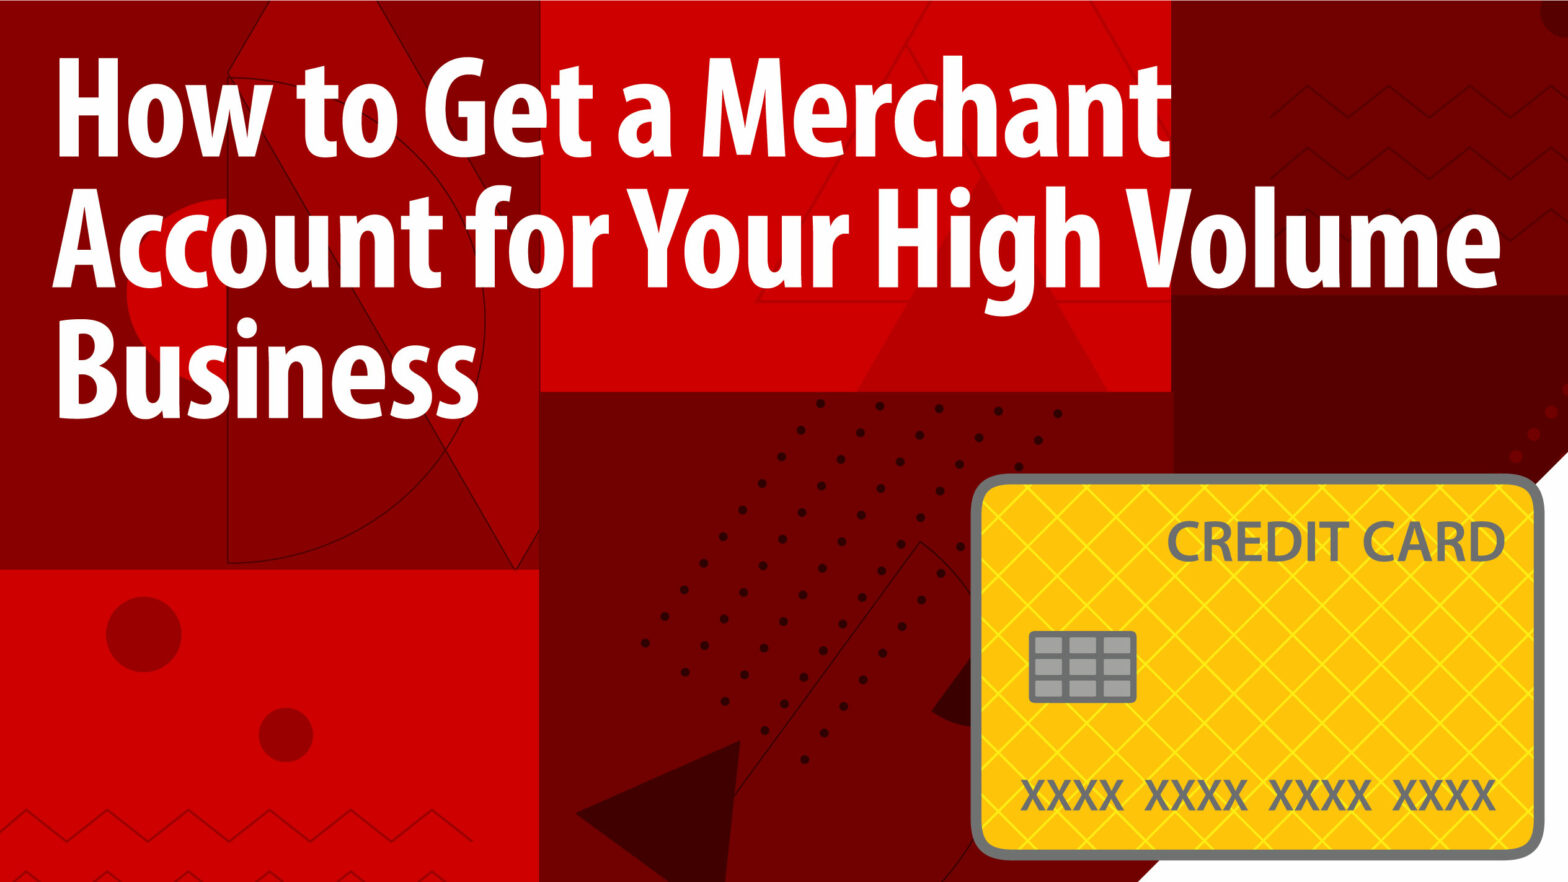 High Volume Merchant Account Article Header